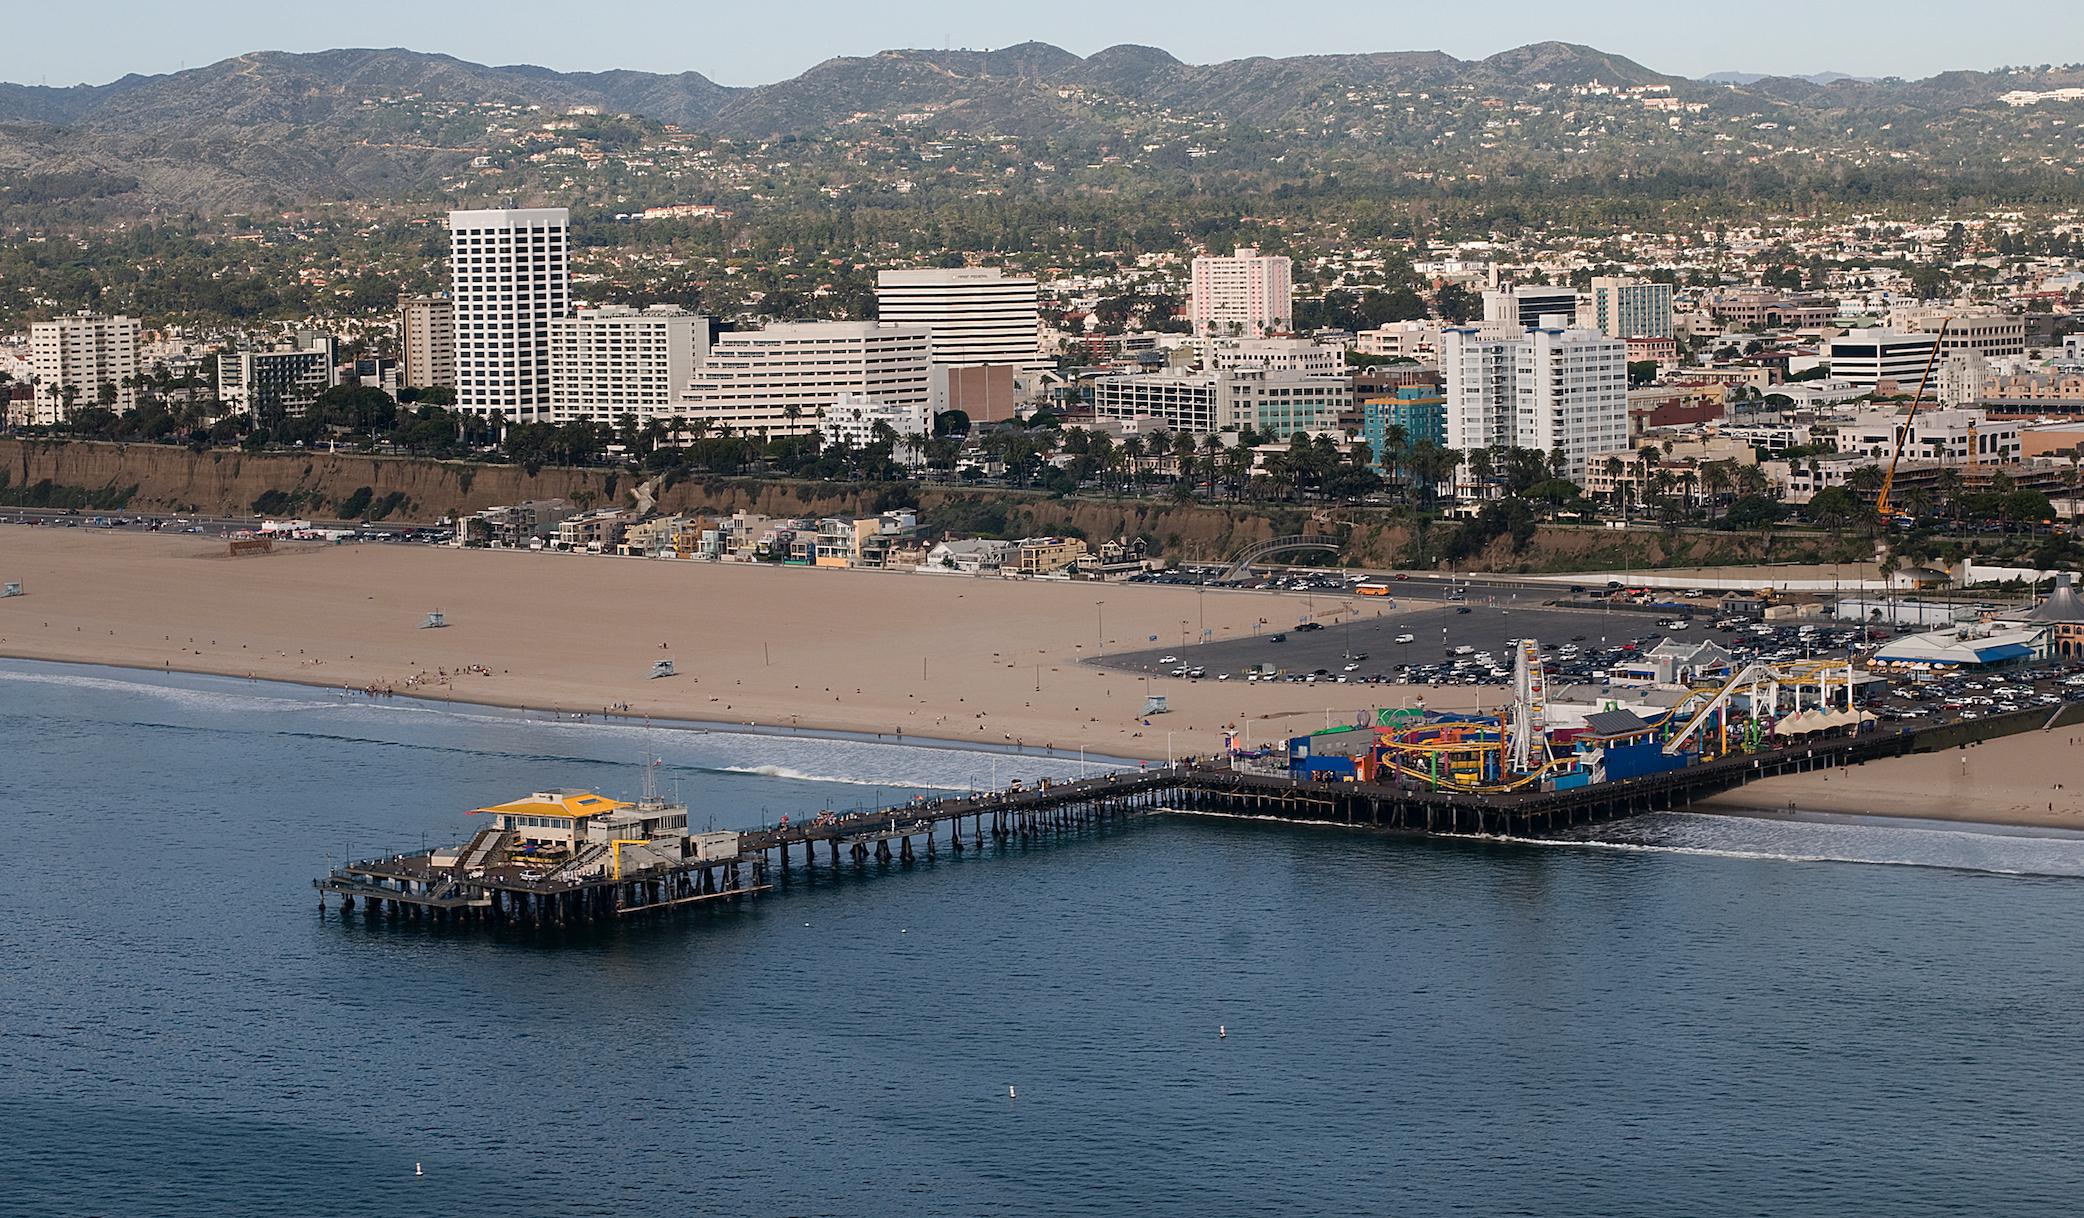 Santa-Monica-photoby-Ed-Grant.png